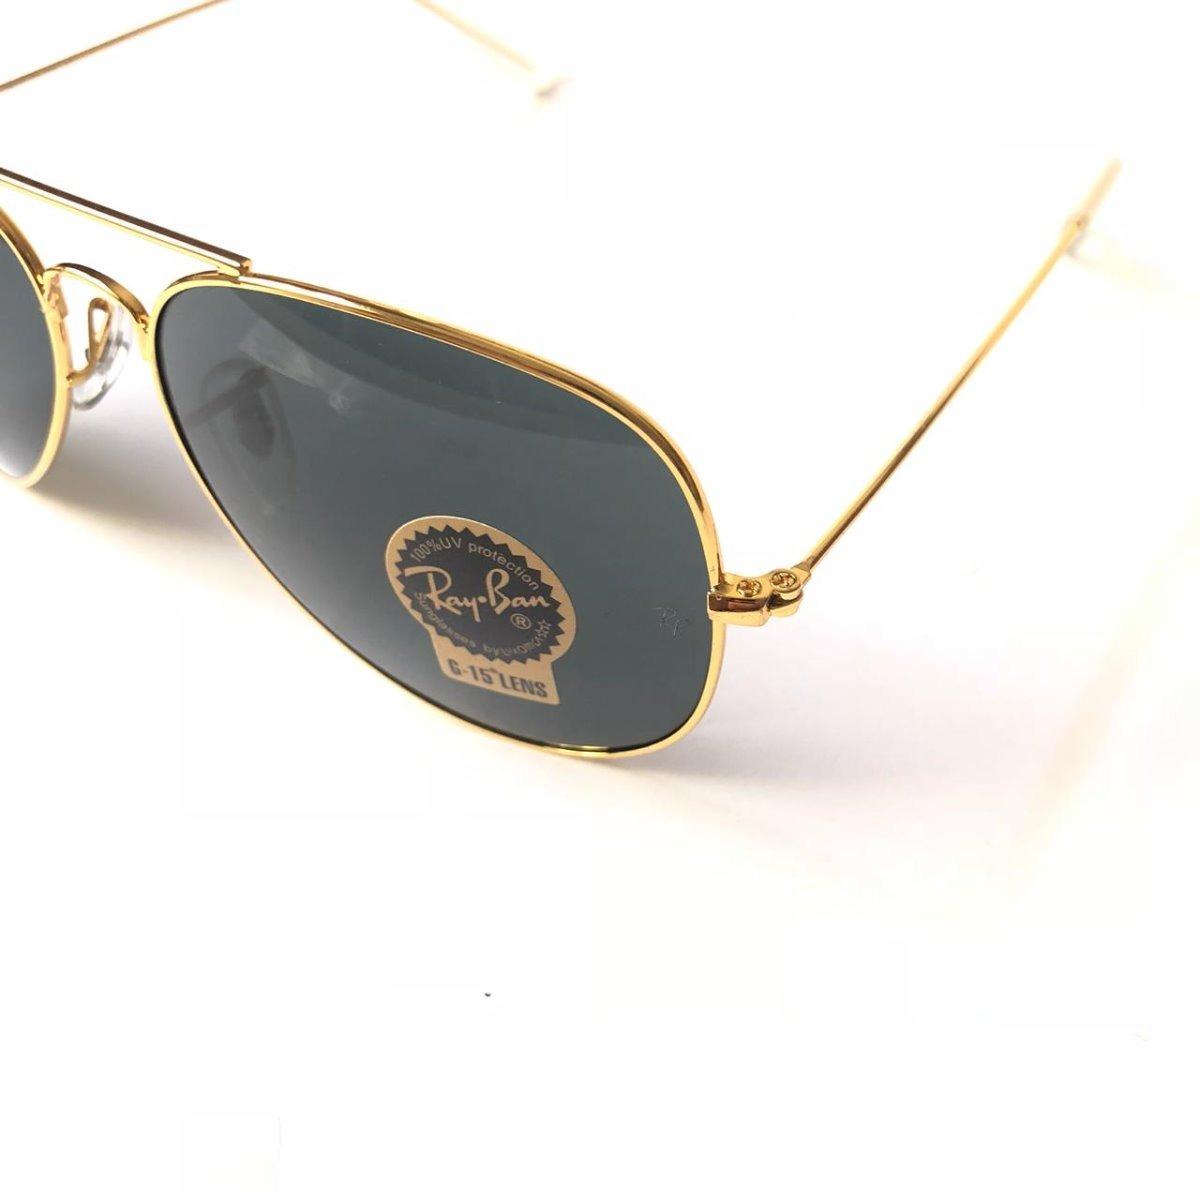 85b524298 óculos ray ban aviador feminino masculino várias cores 2019. Carregando  zoom.